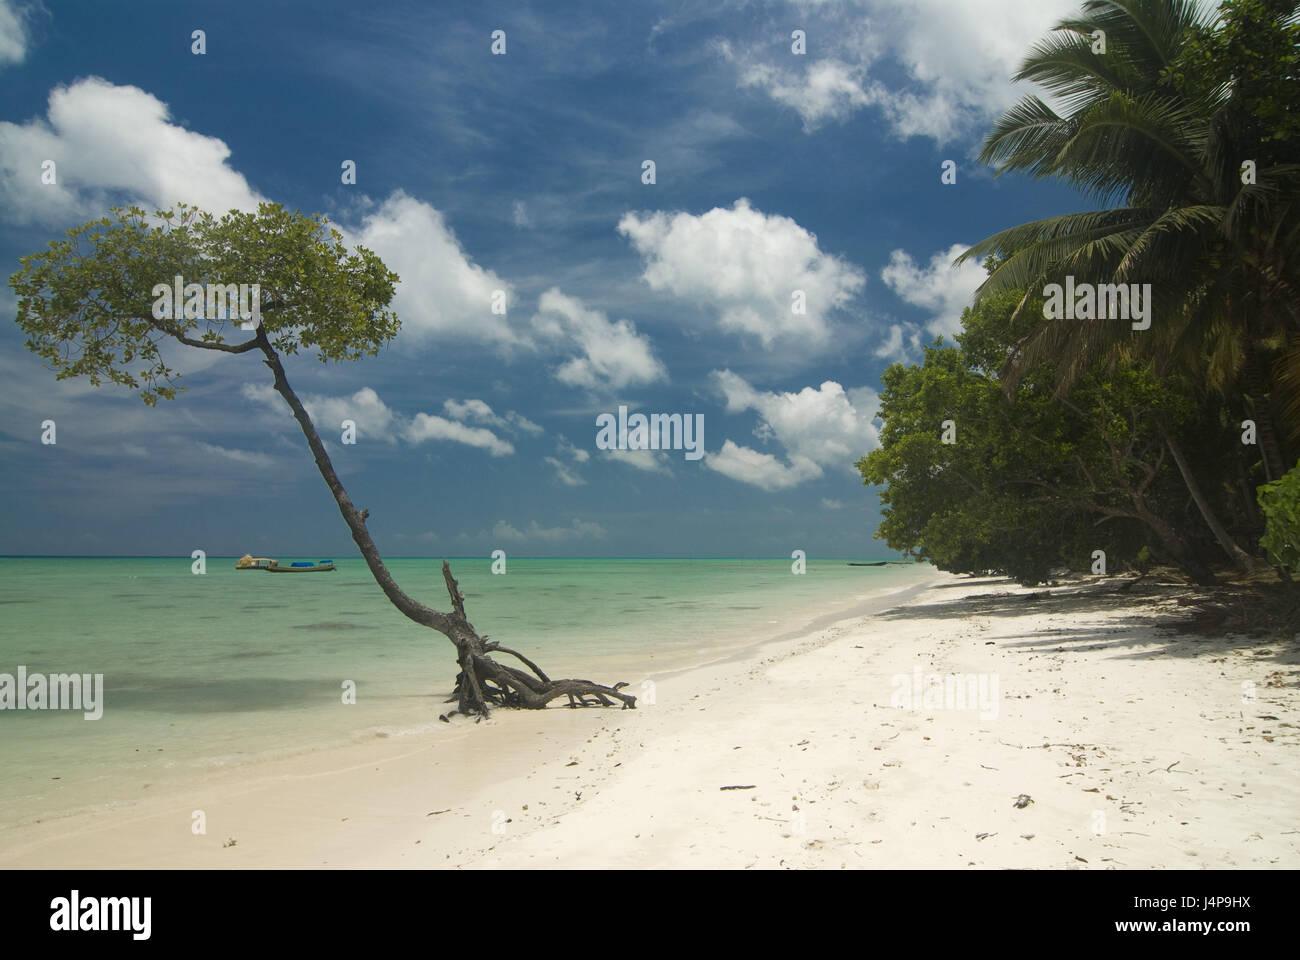 Sandy beach, tree, Indian ocean, Havelock Insel, Andamanen, India, - Stock Image